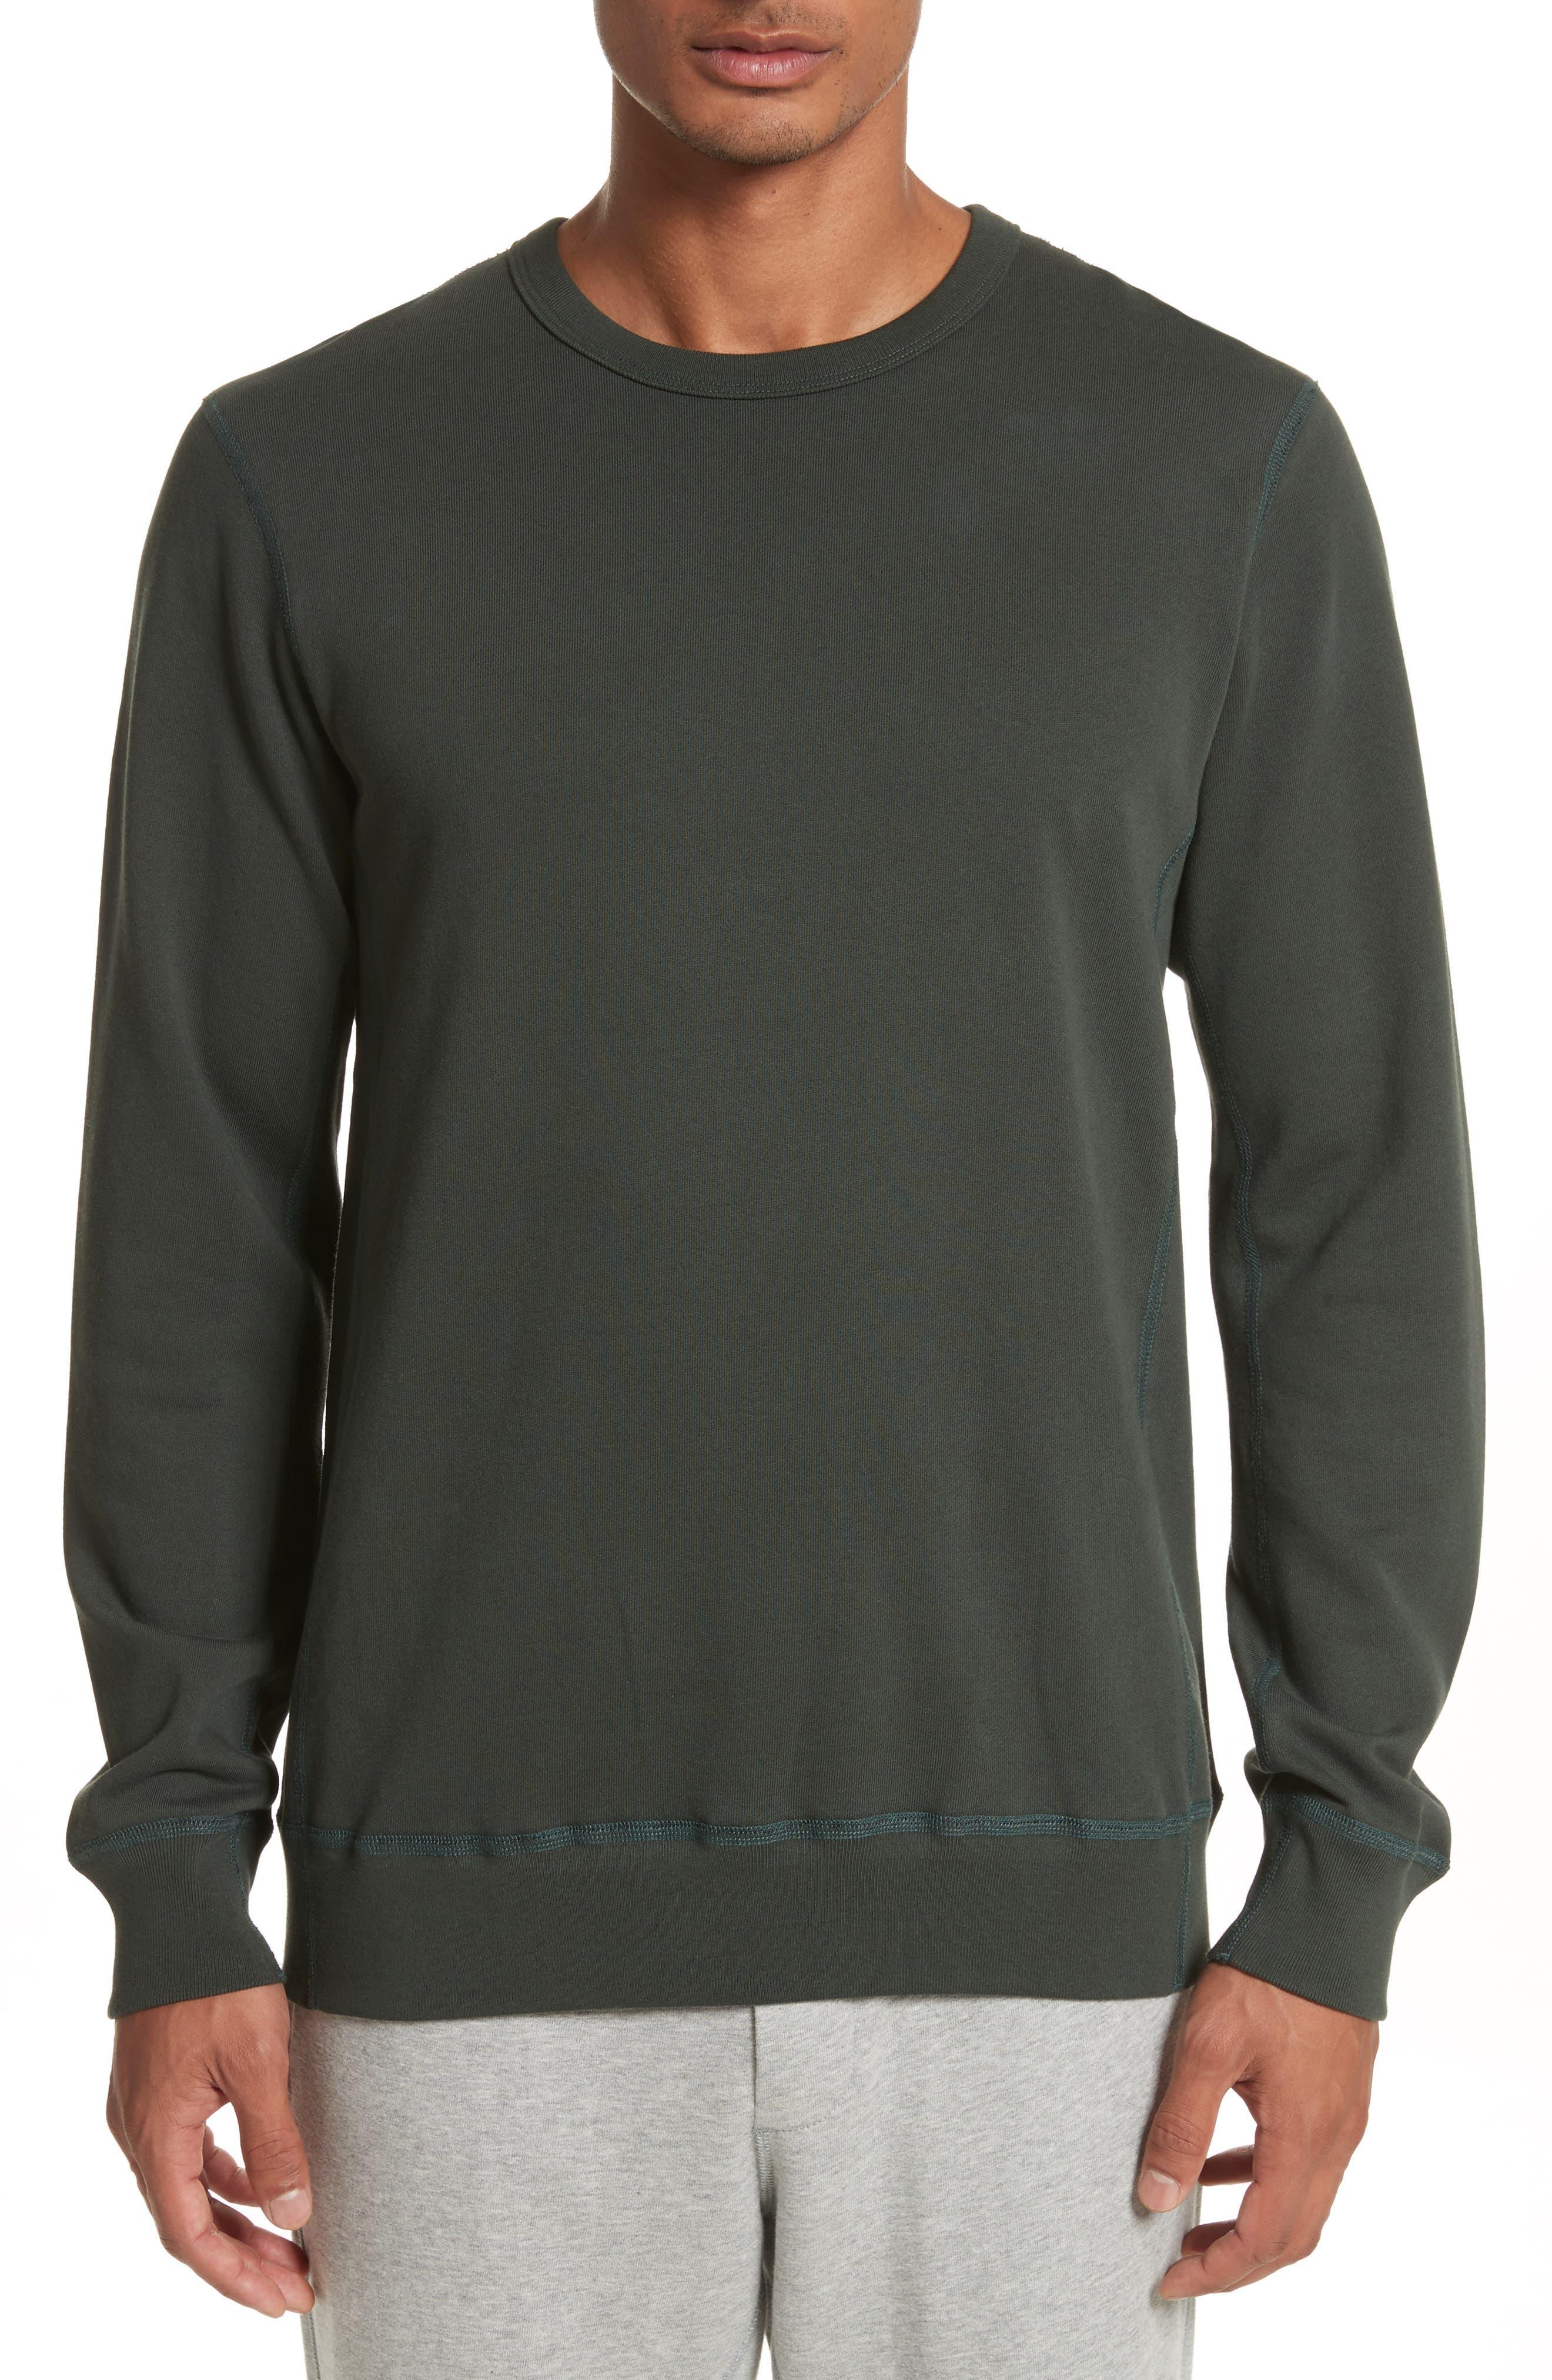 Crewneck Sweatshirt,                         Main,                         color, Jungle Green